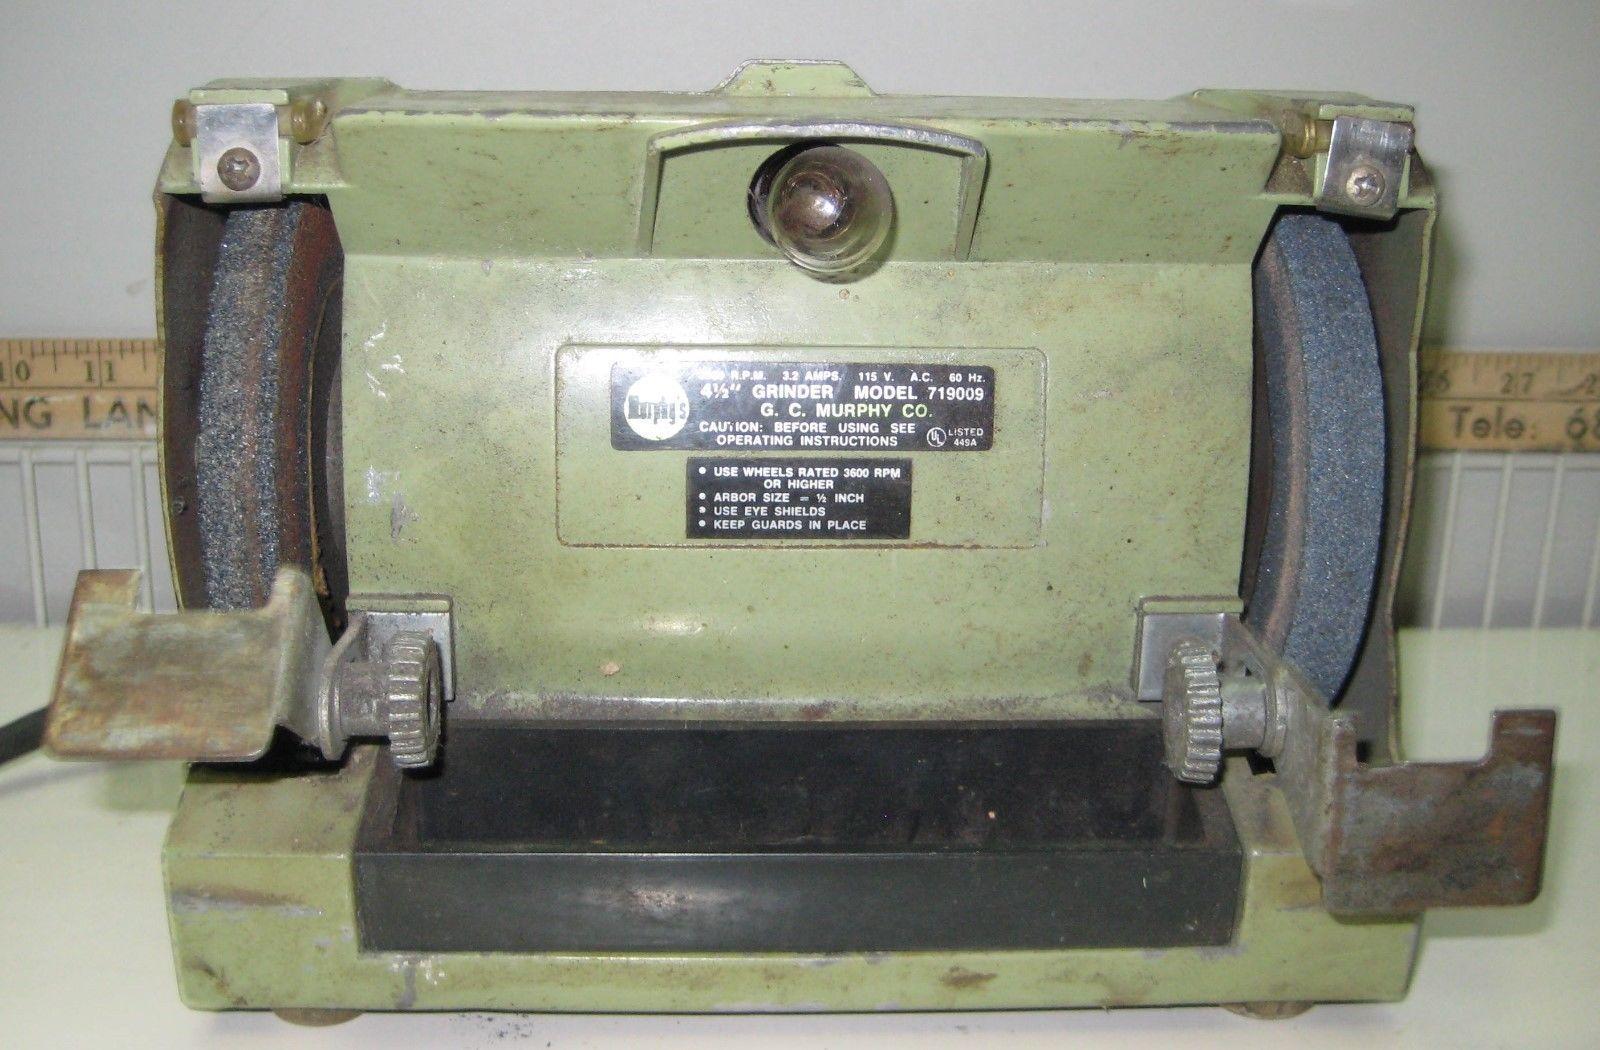 G C Murphy 4 1 2 Bench Grinder Works Vintage Cute Small Space Grinder Blacksmithing